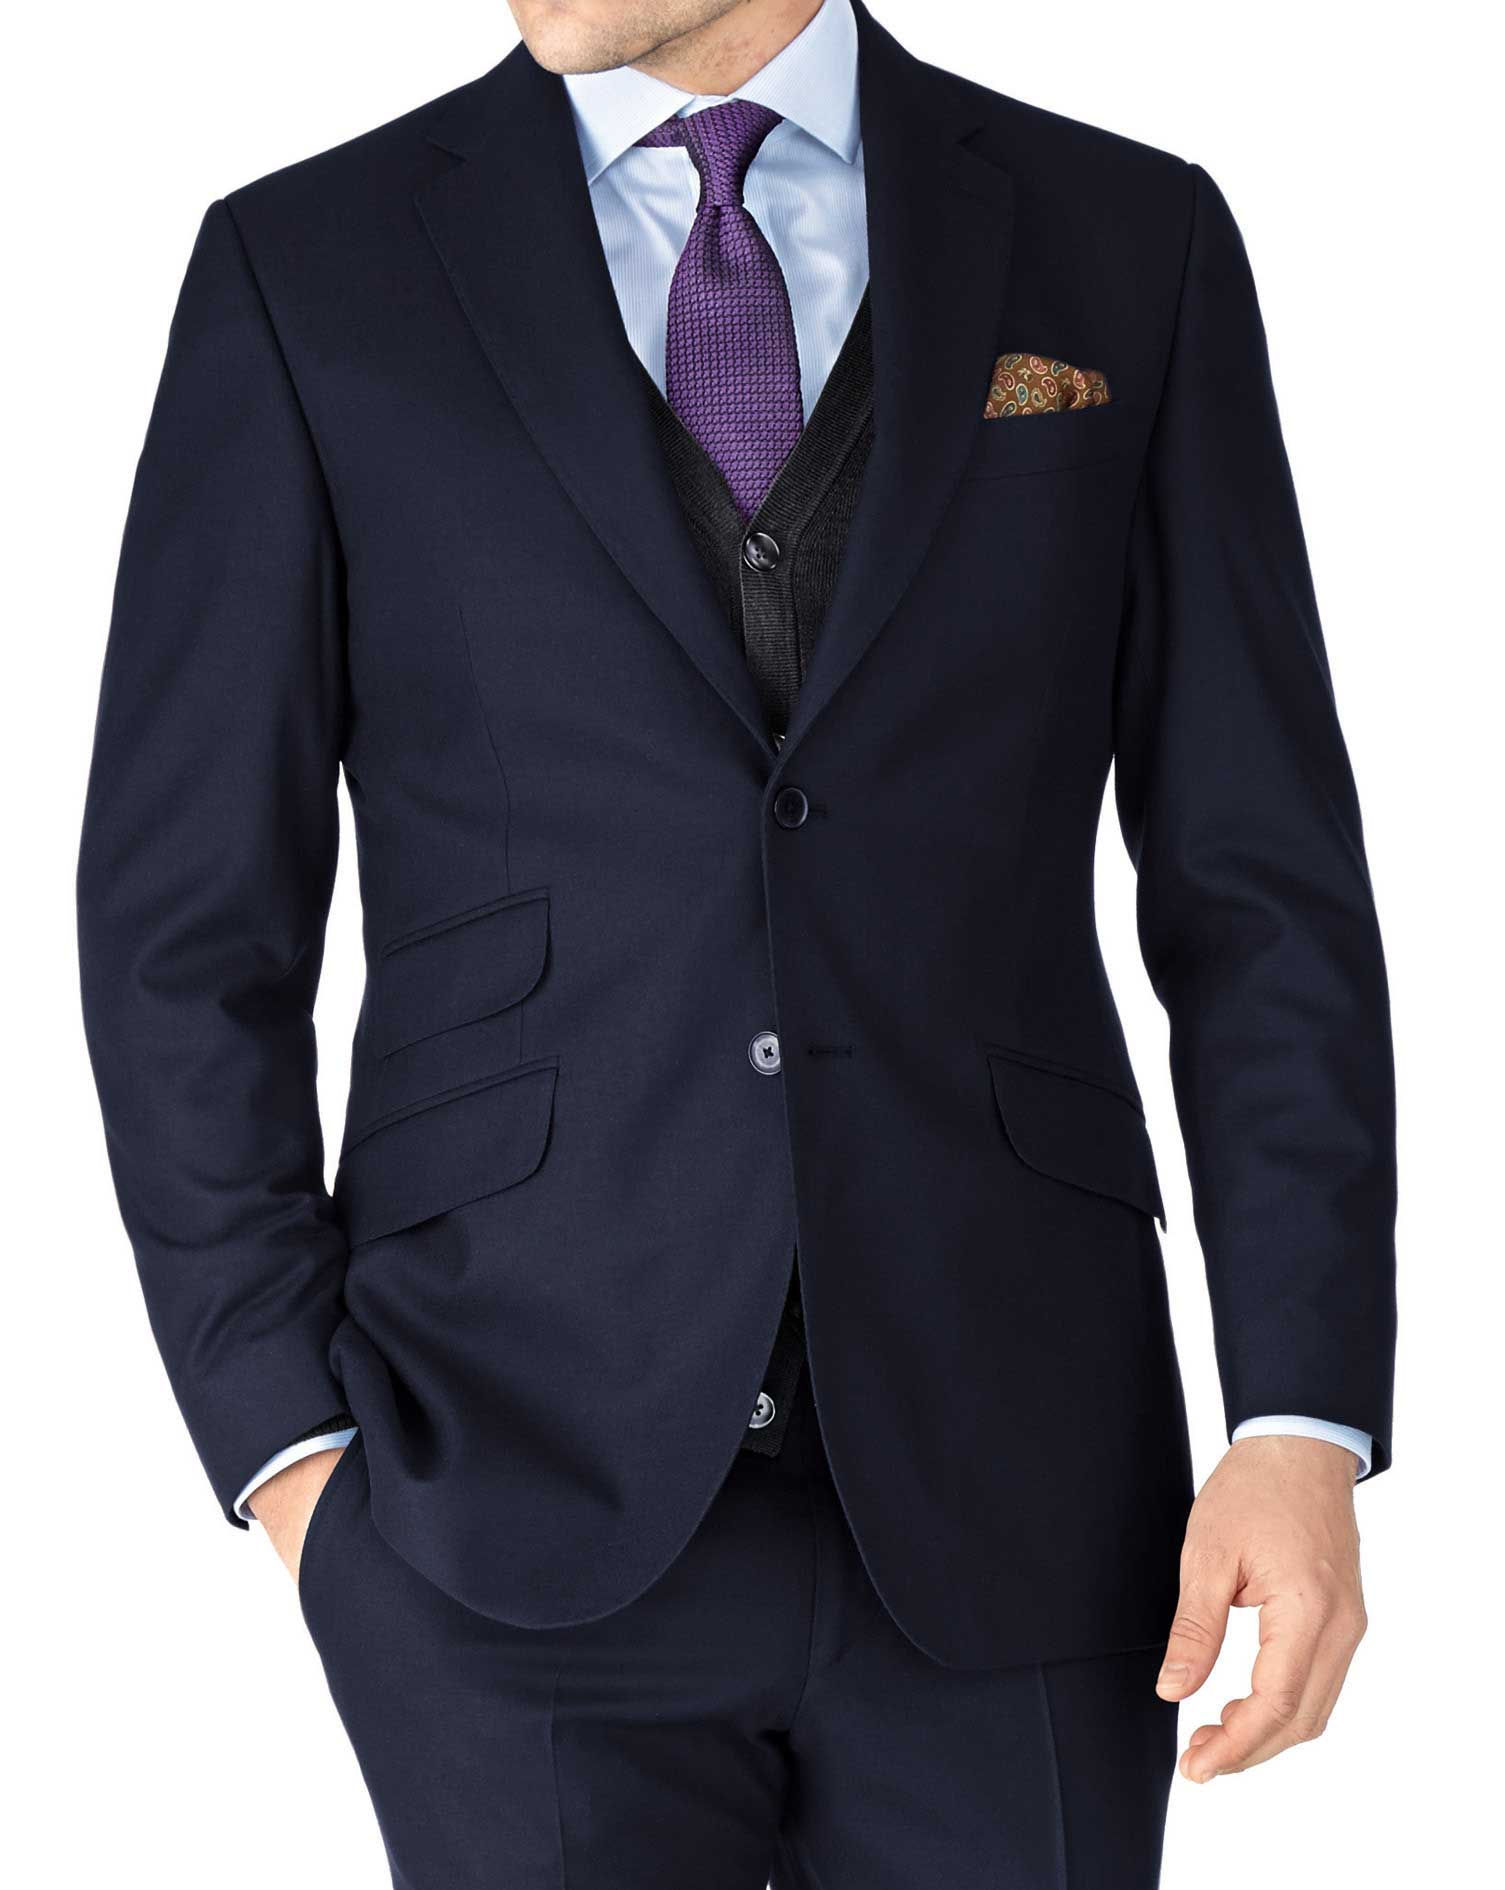 Navy Slim Fit British Serge Luxury Suit Wool Jacket Size 40 Long by Charles Tyrwhitt